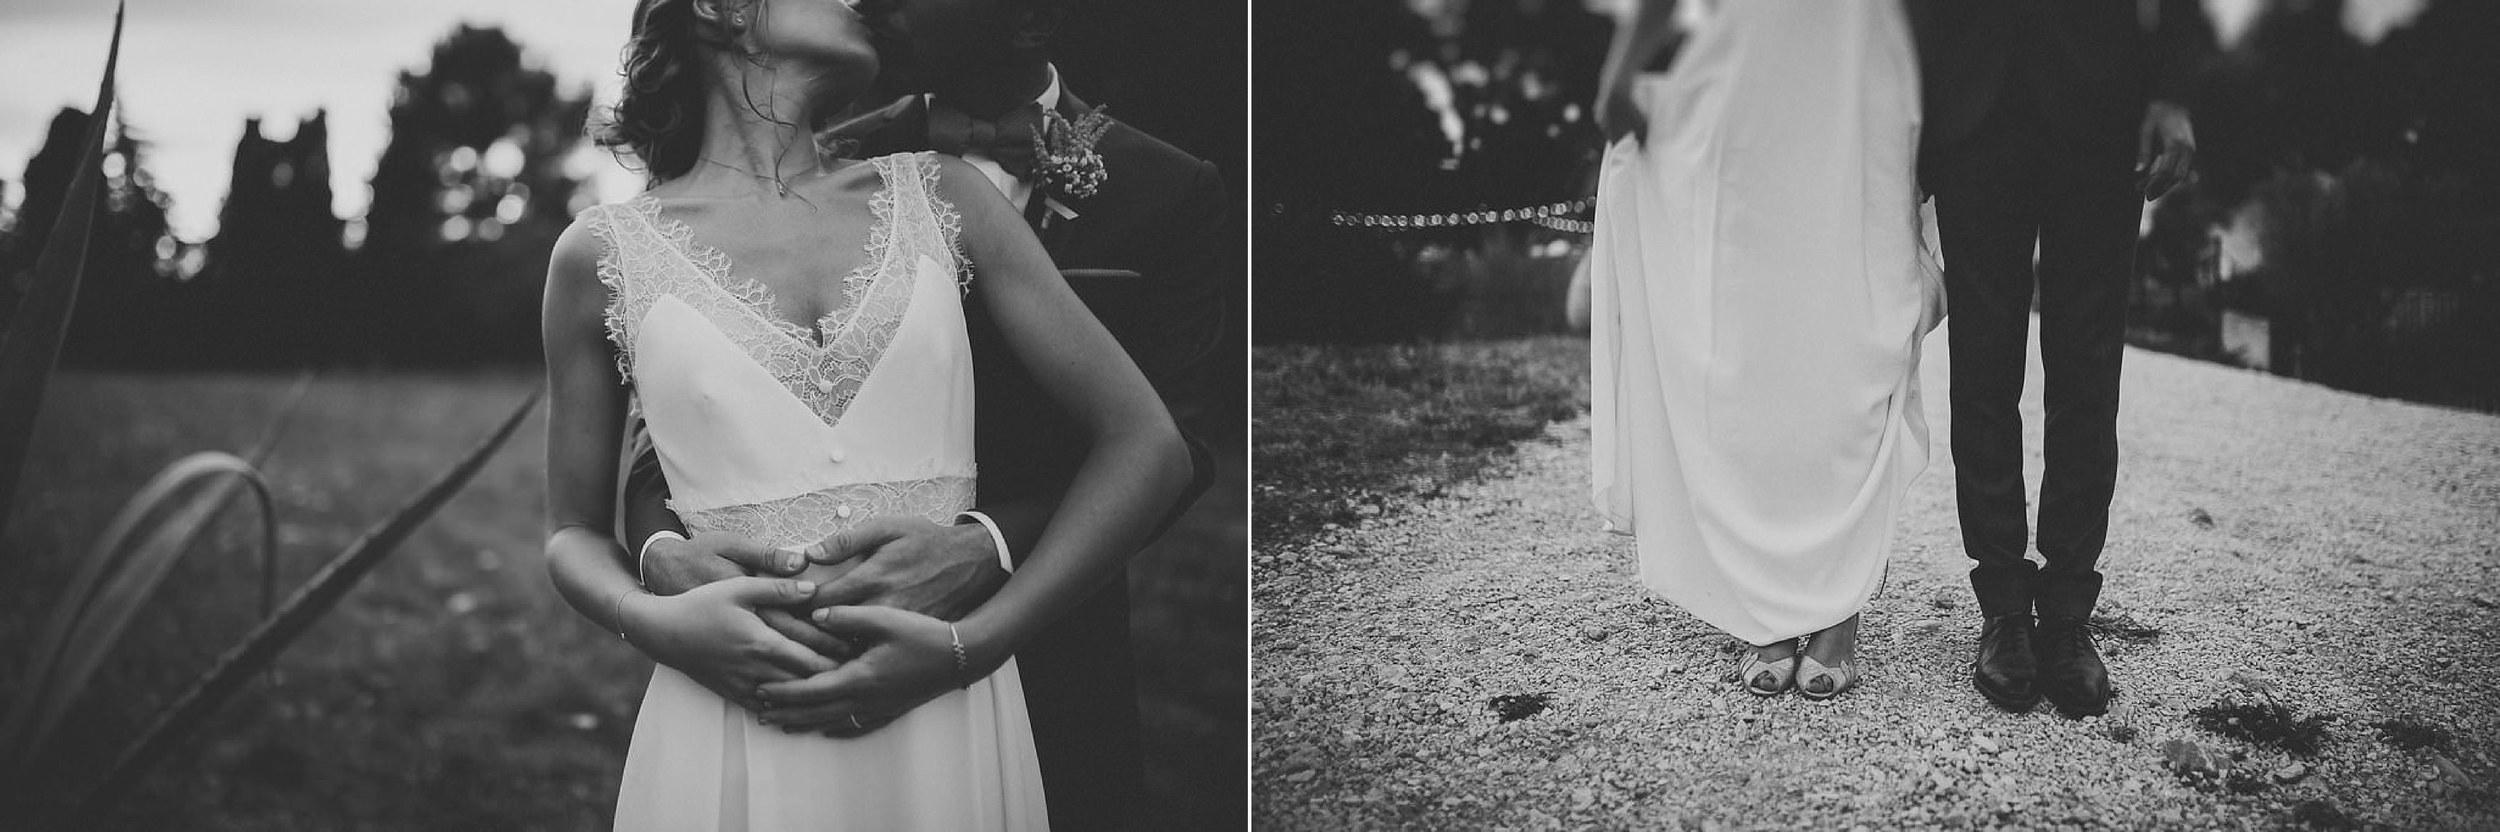 mariage-hyeres-villa-brignac-steven-bassillieaux-bordeaux-dordogne-wedding-photographe85.jpg